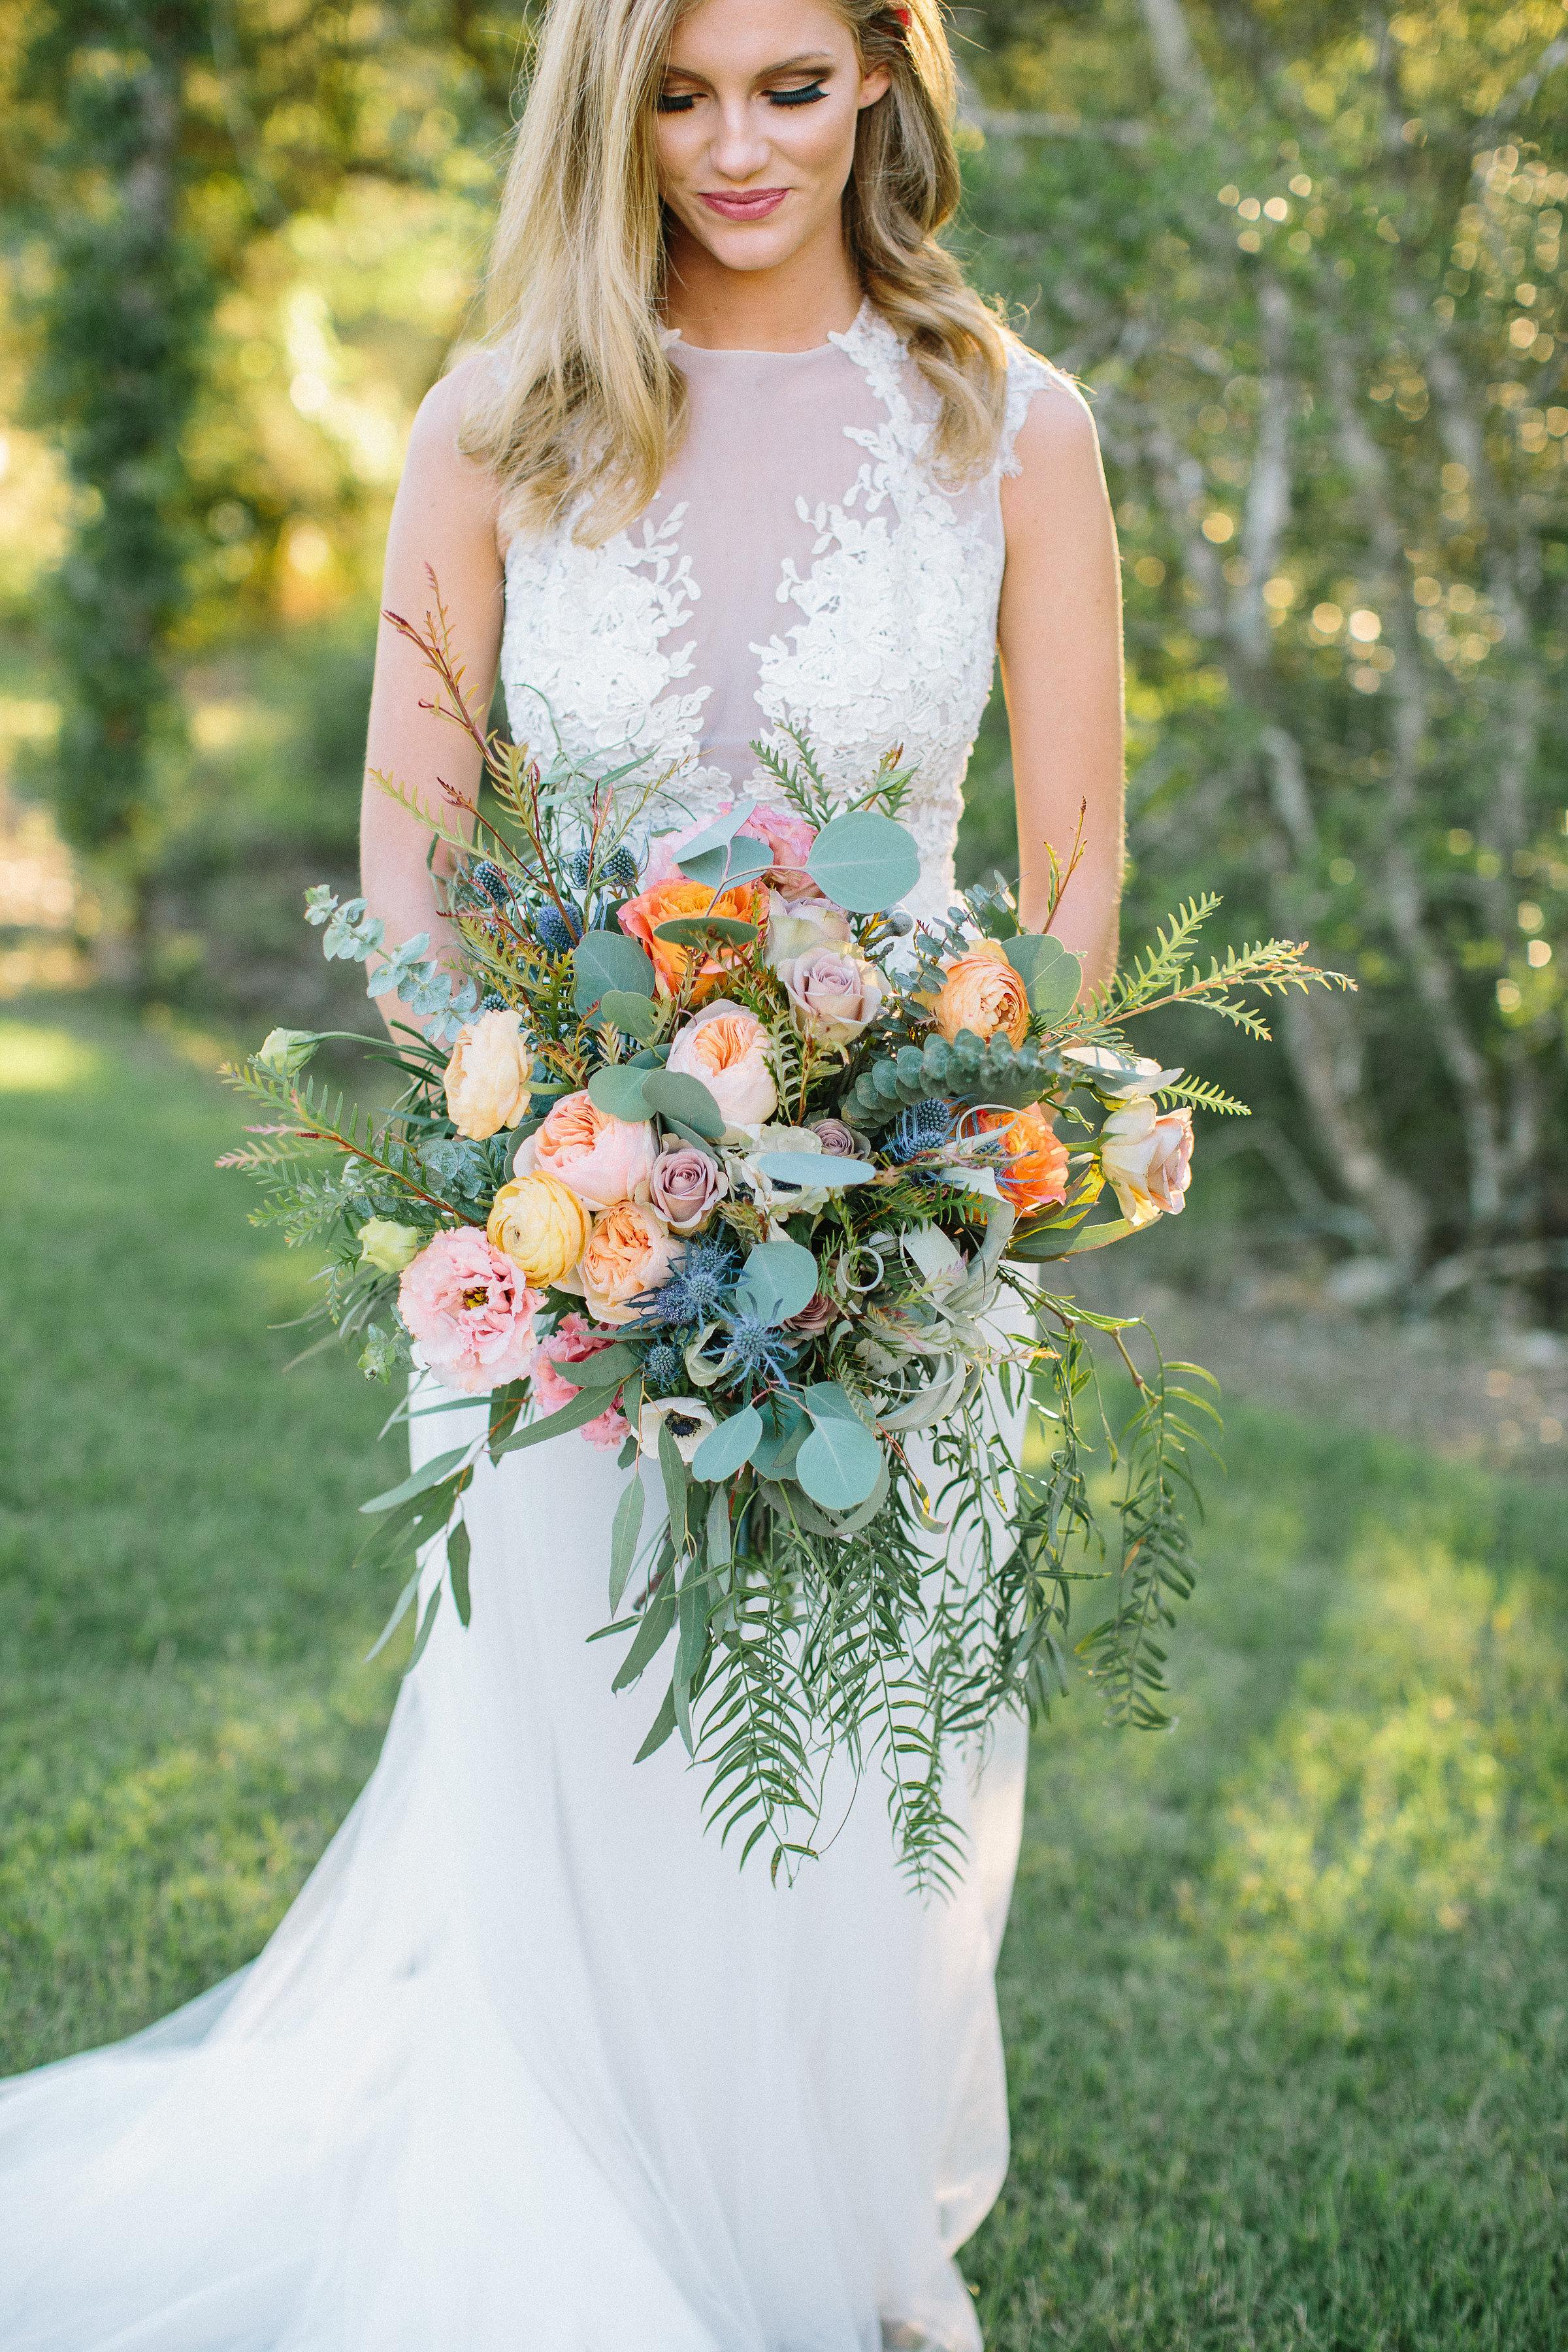 Ellen-Ashton-Photography-Peach-Creek-Ranch-Weddings-Wed-and-Prosper265